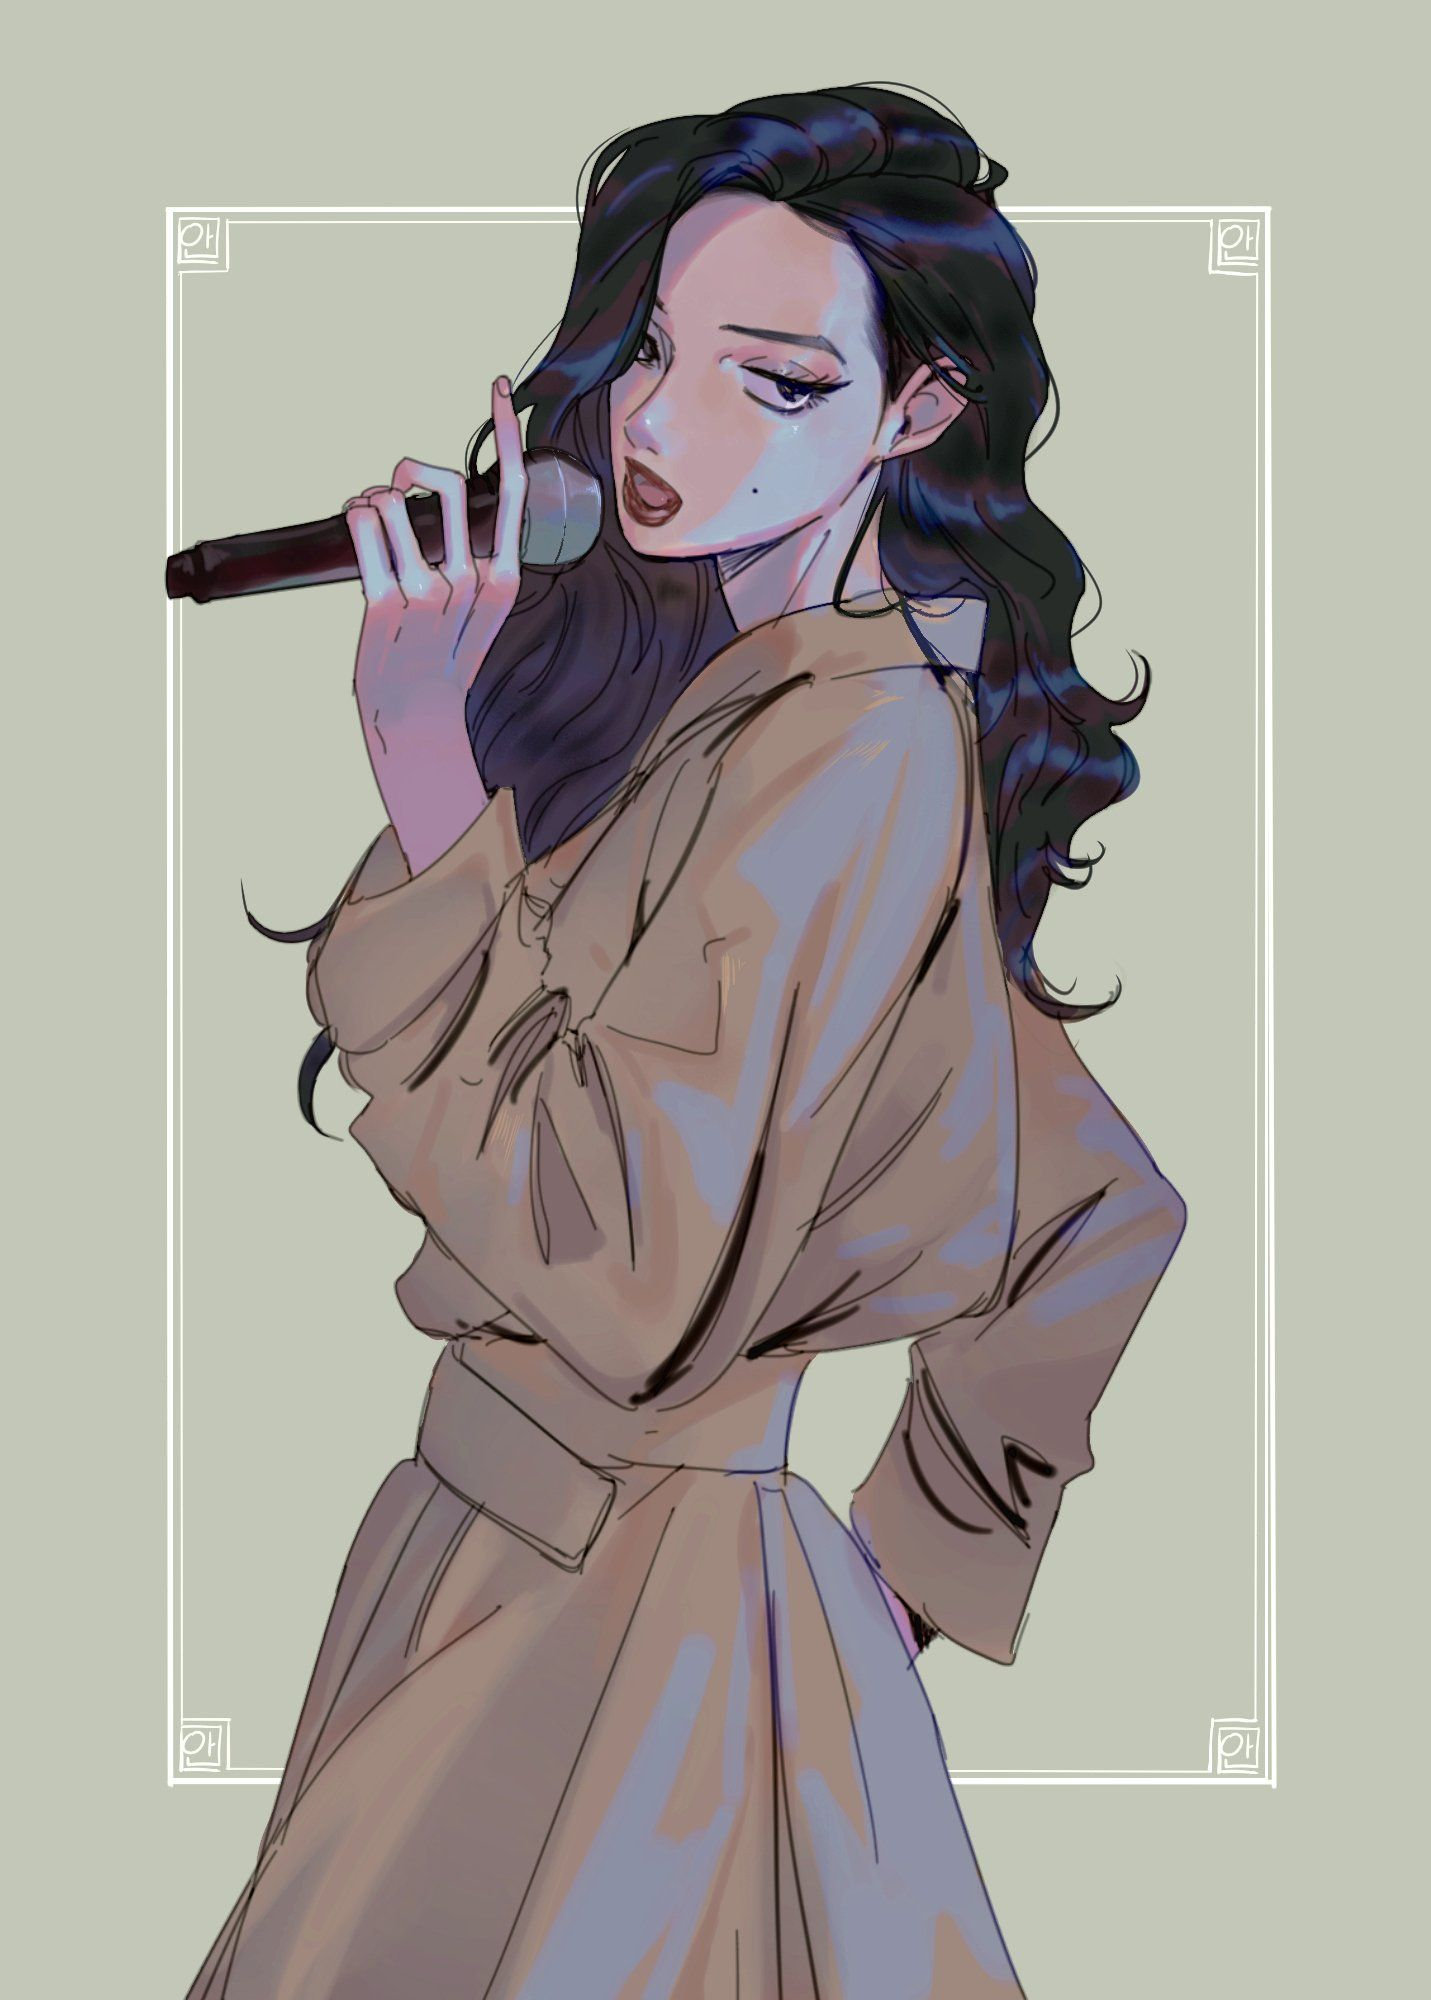 Mamamoo Hwasa Pop Illustration Cartoon Art Styles Character Art